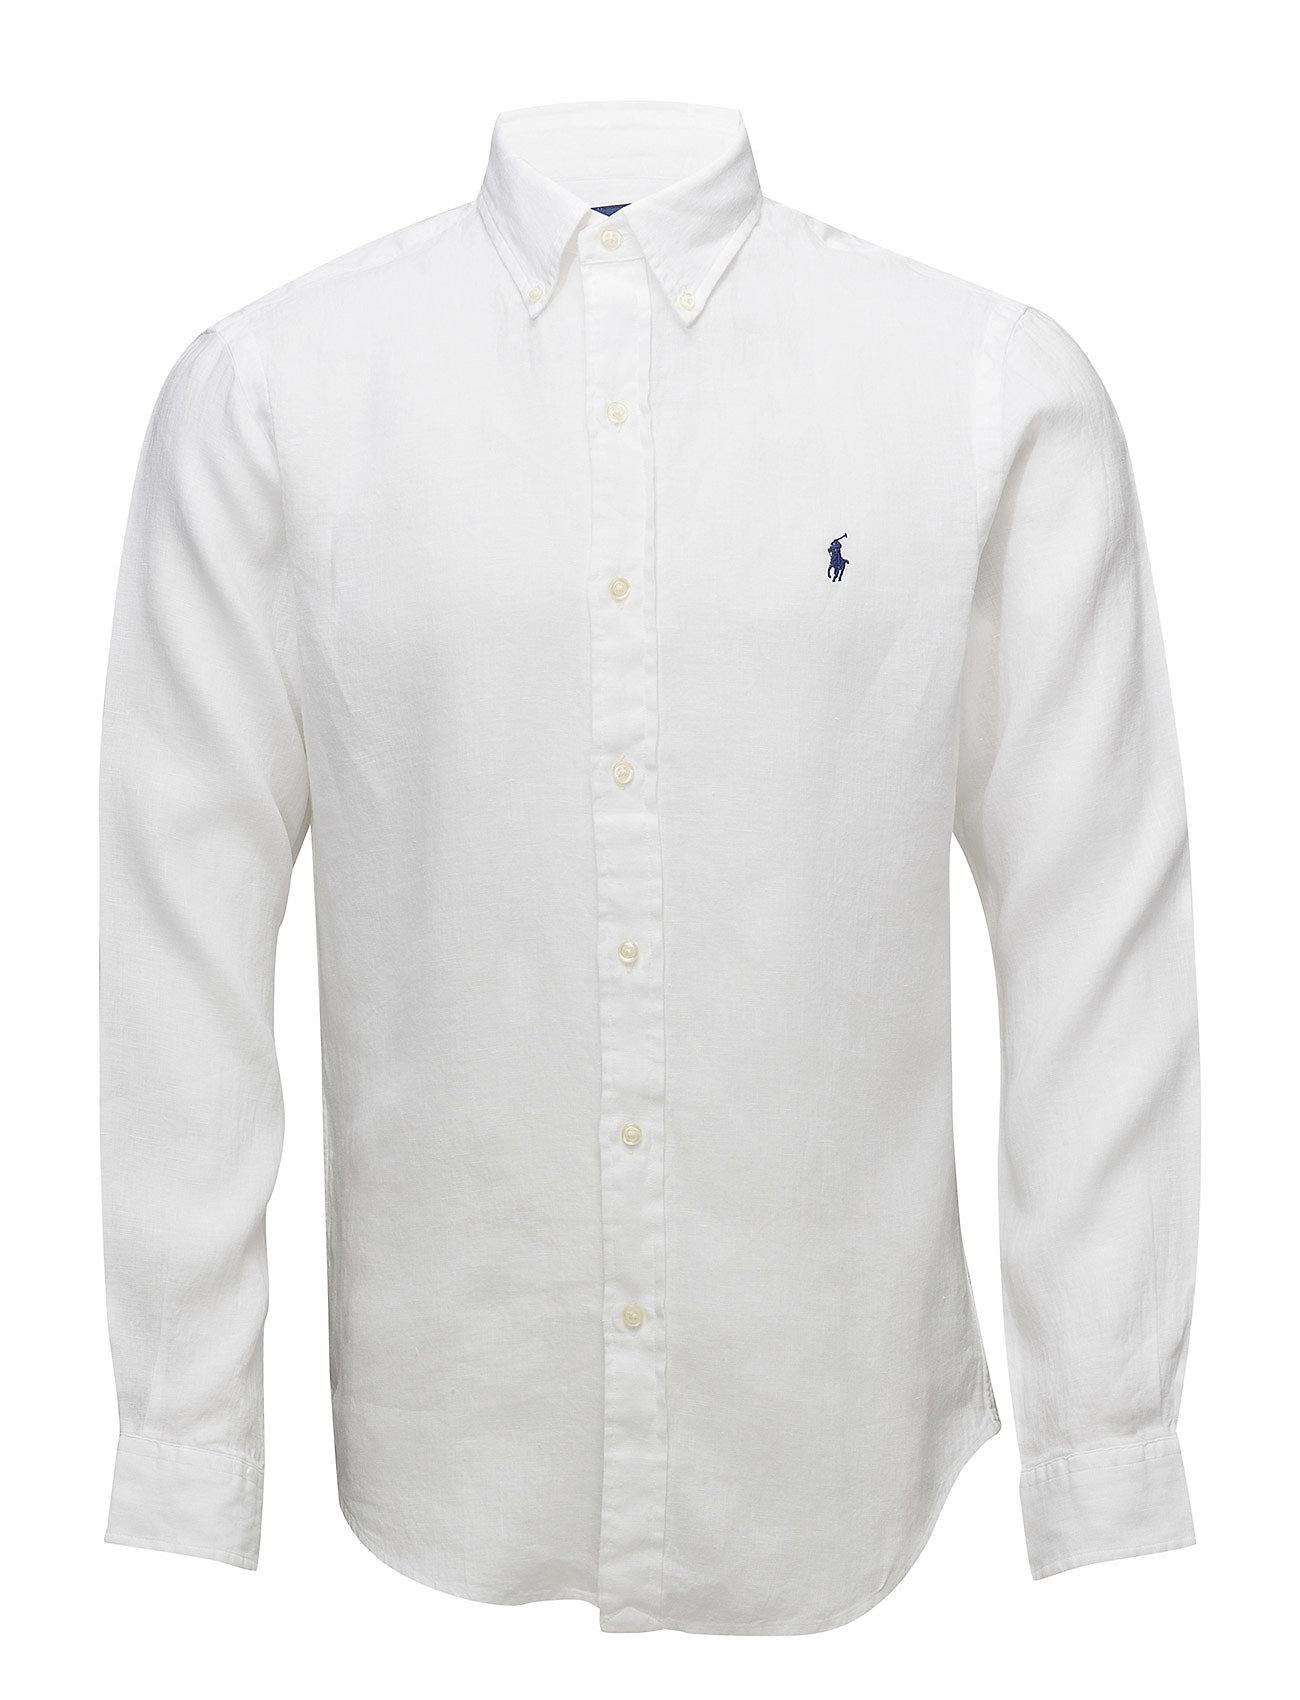 90da25f6a ... button down cargo oxford shirt white xl 5916e b1cf0  get polo ralph  lauren slim fit linen sport shirt 8e2fa e5769